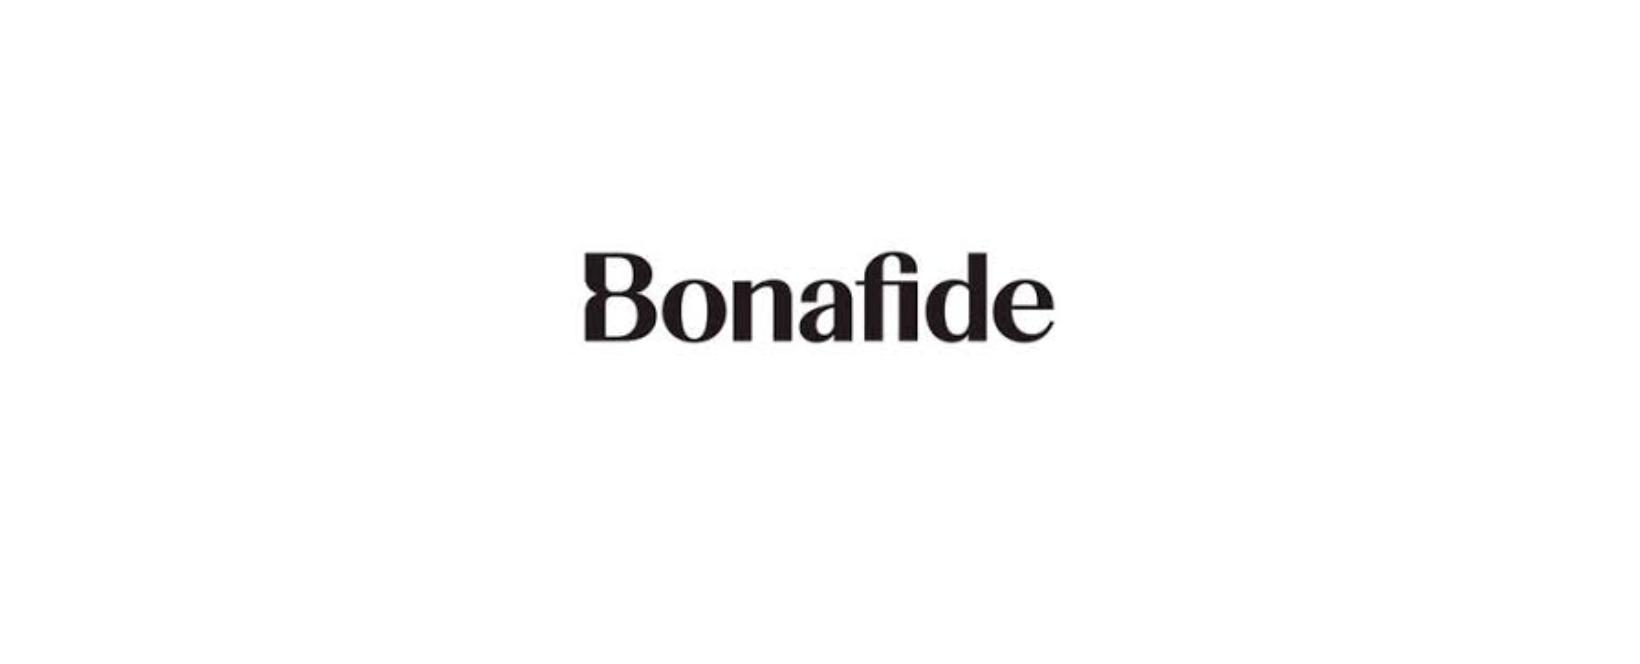 Bonafide Discount Code 2021